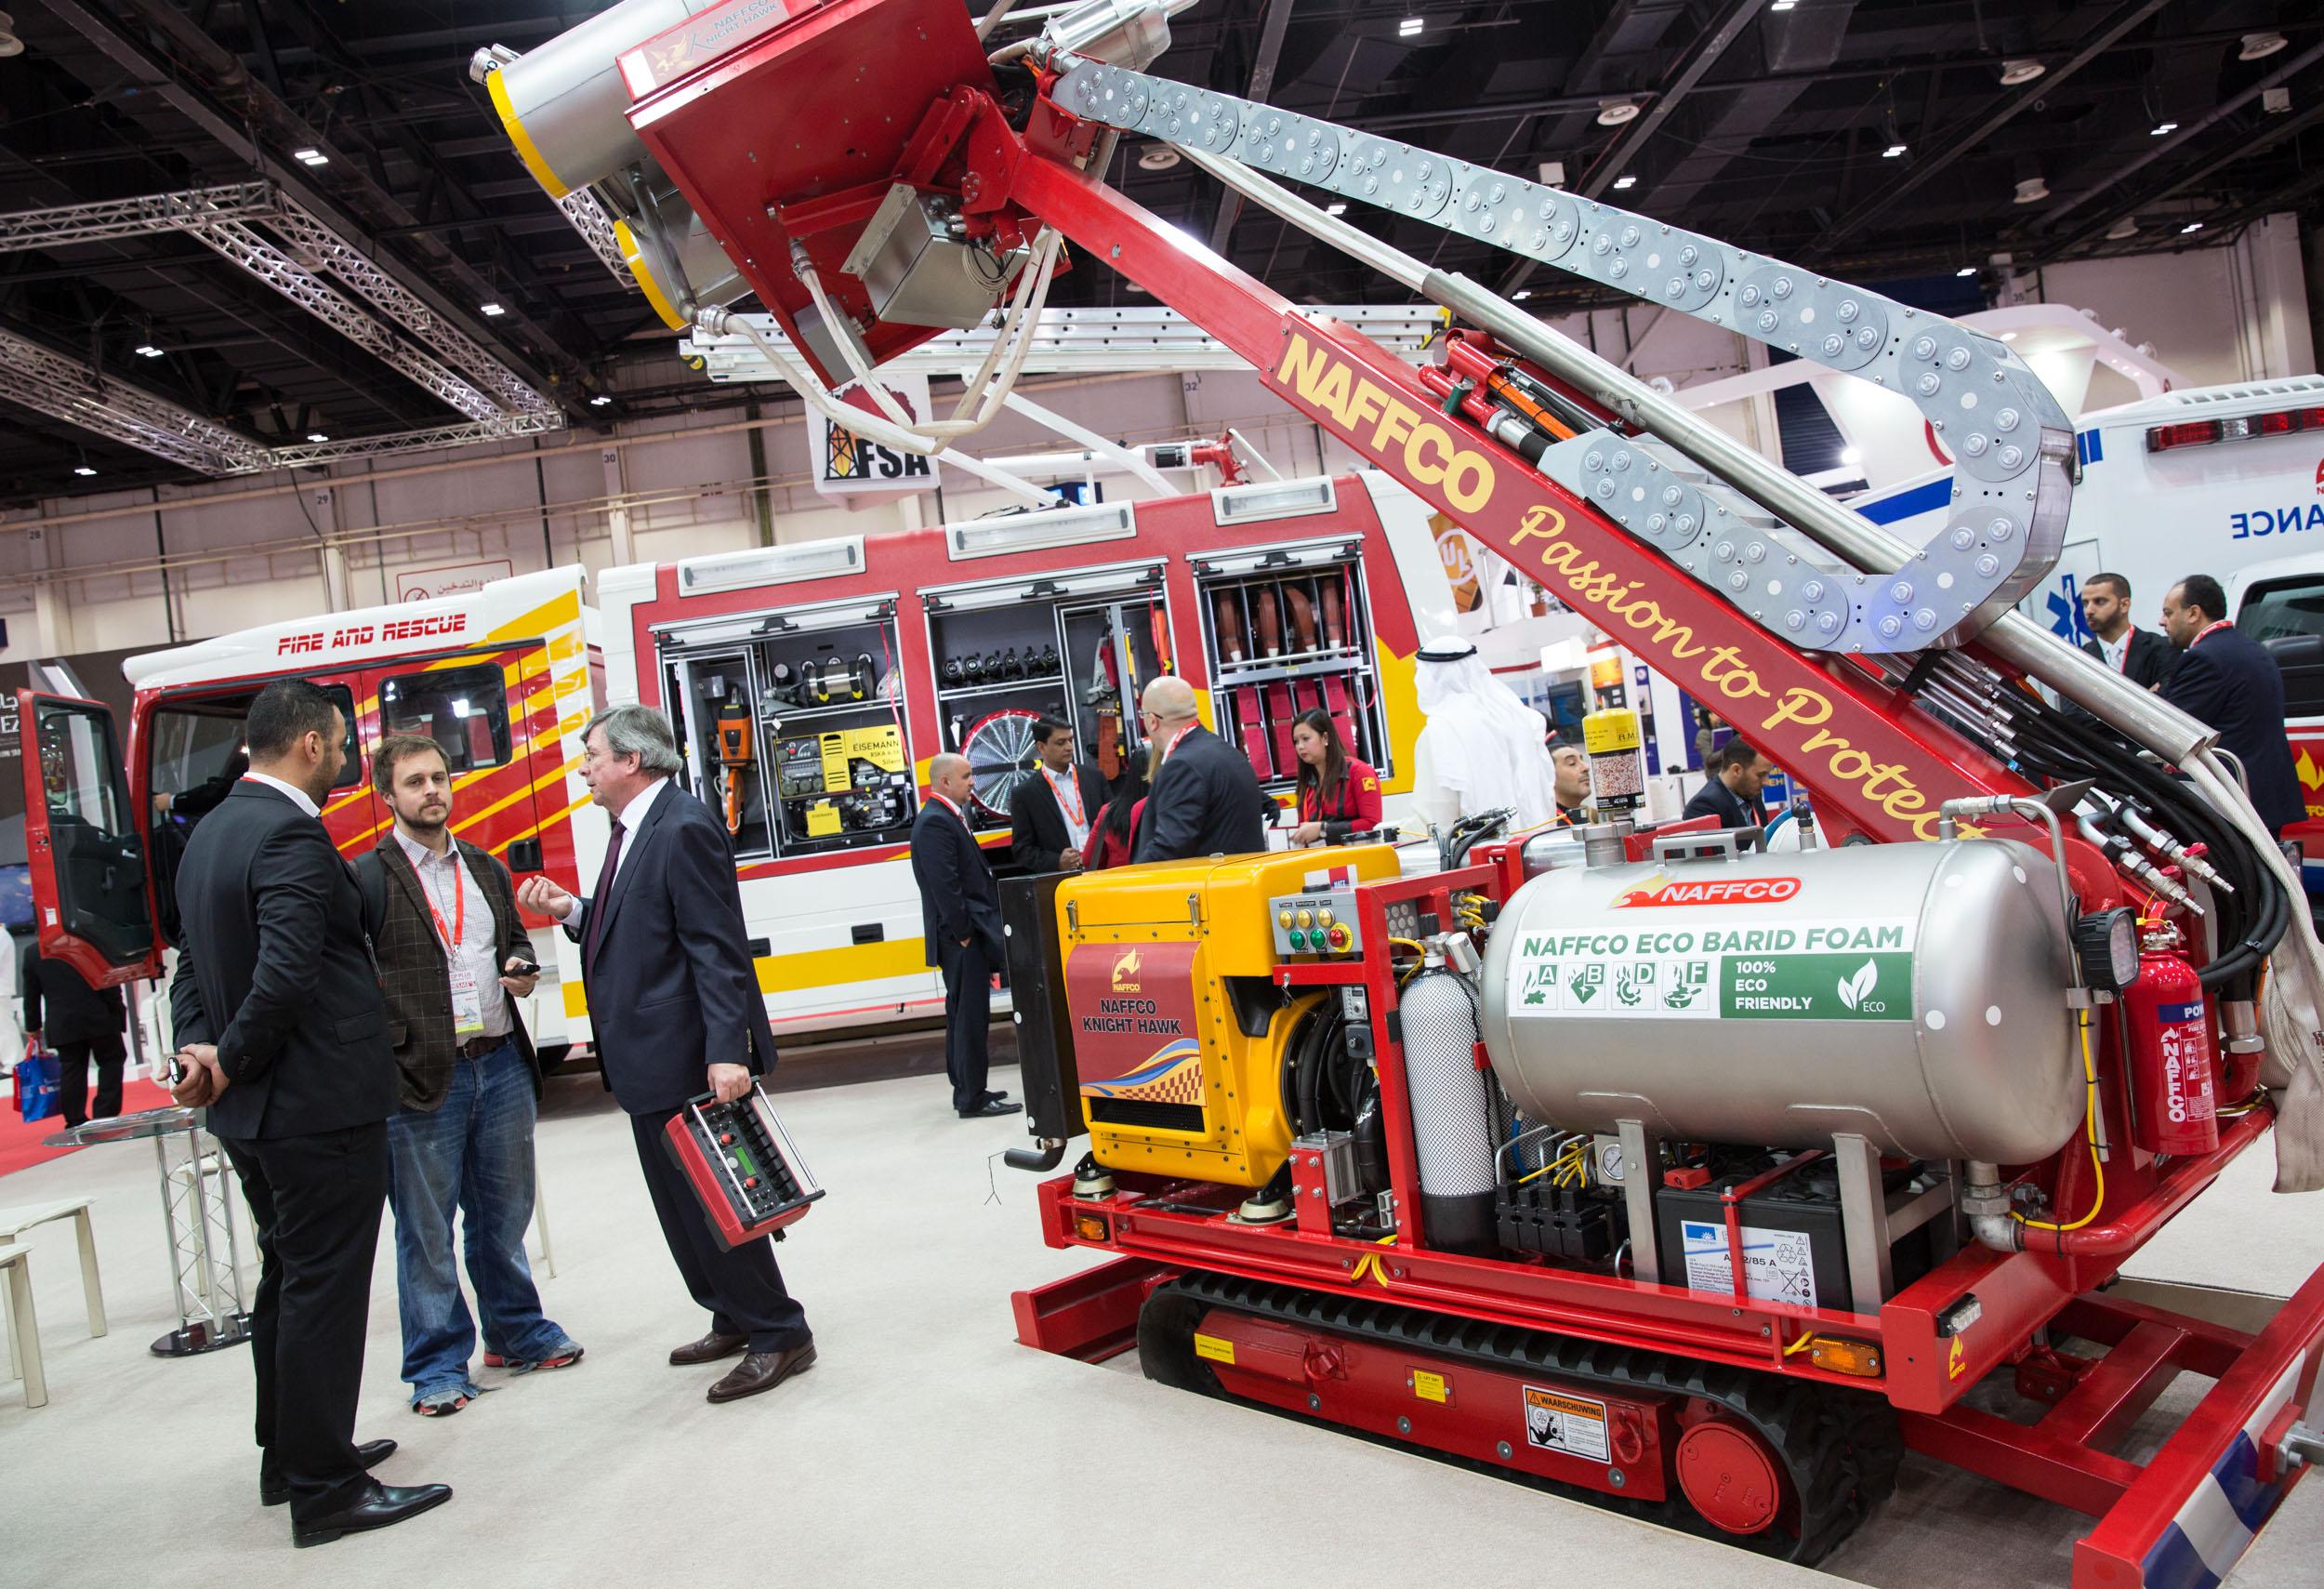 Intersec Dubai Exhibition Booth